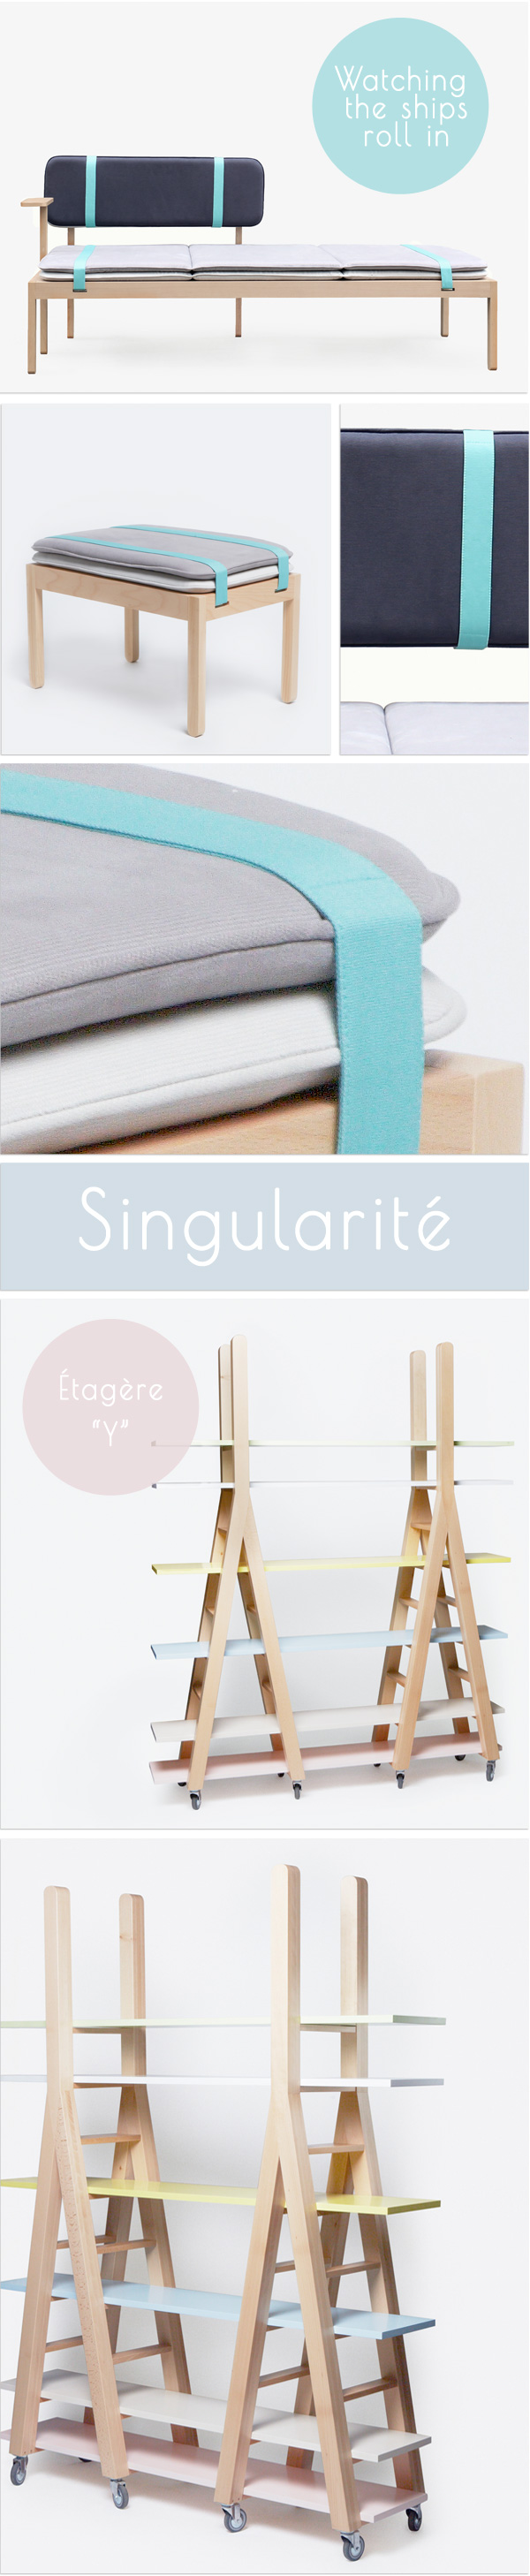 LieblingsProdukte: Singularité -